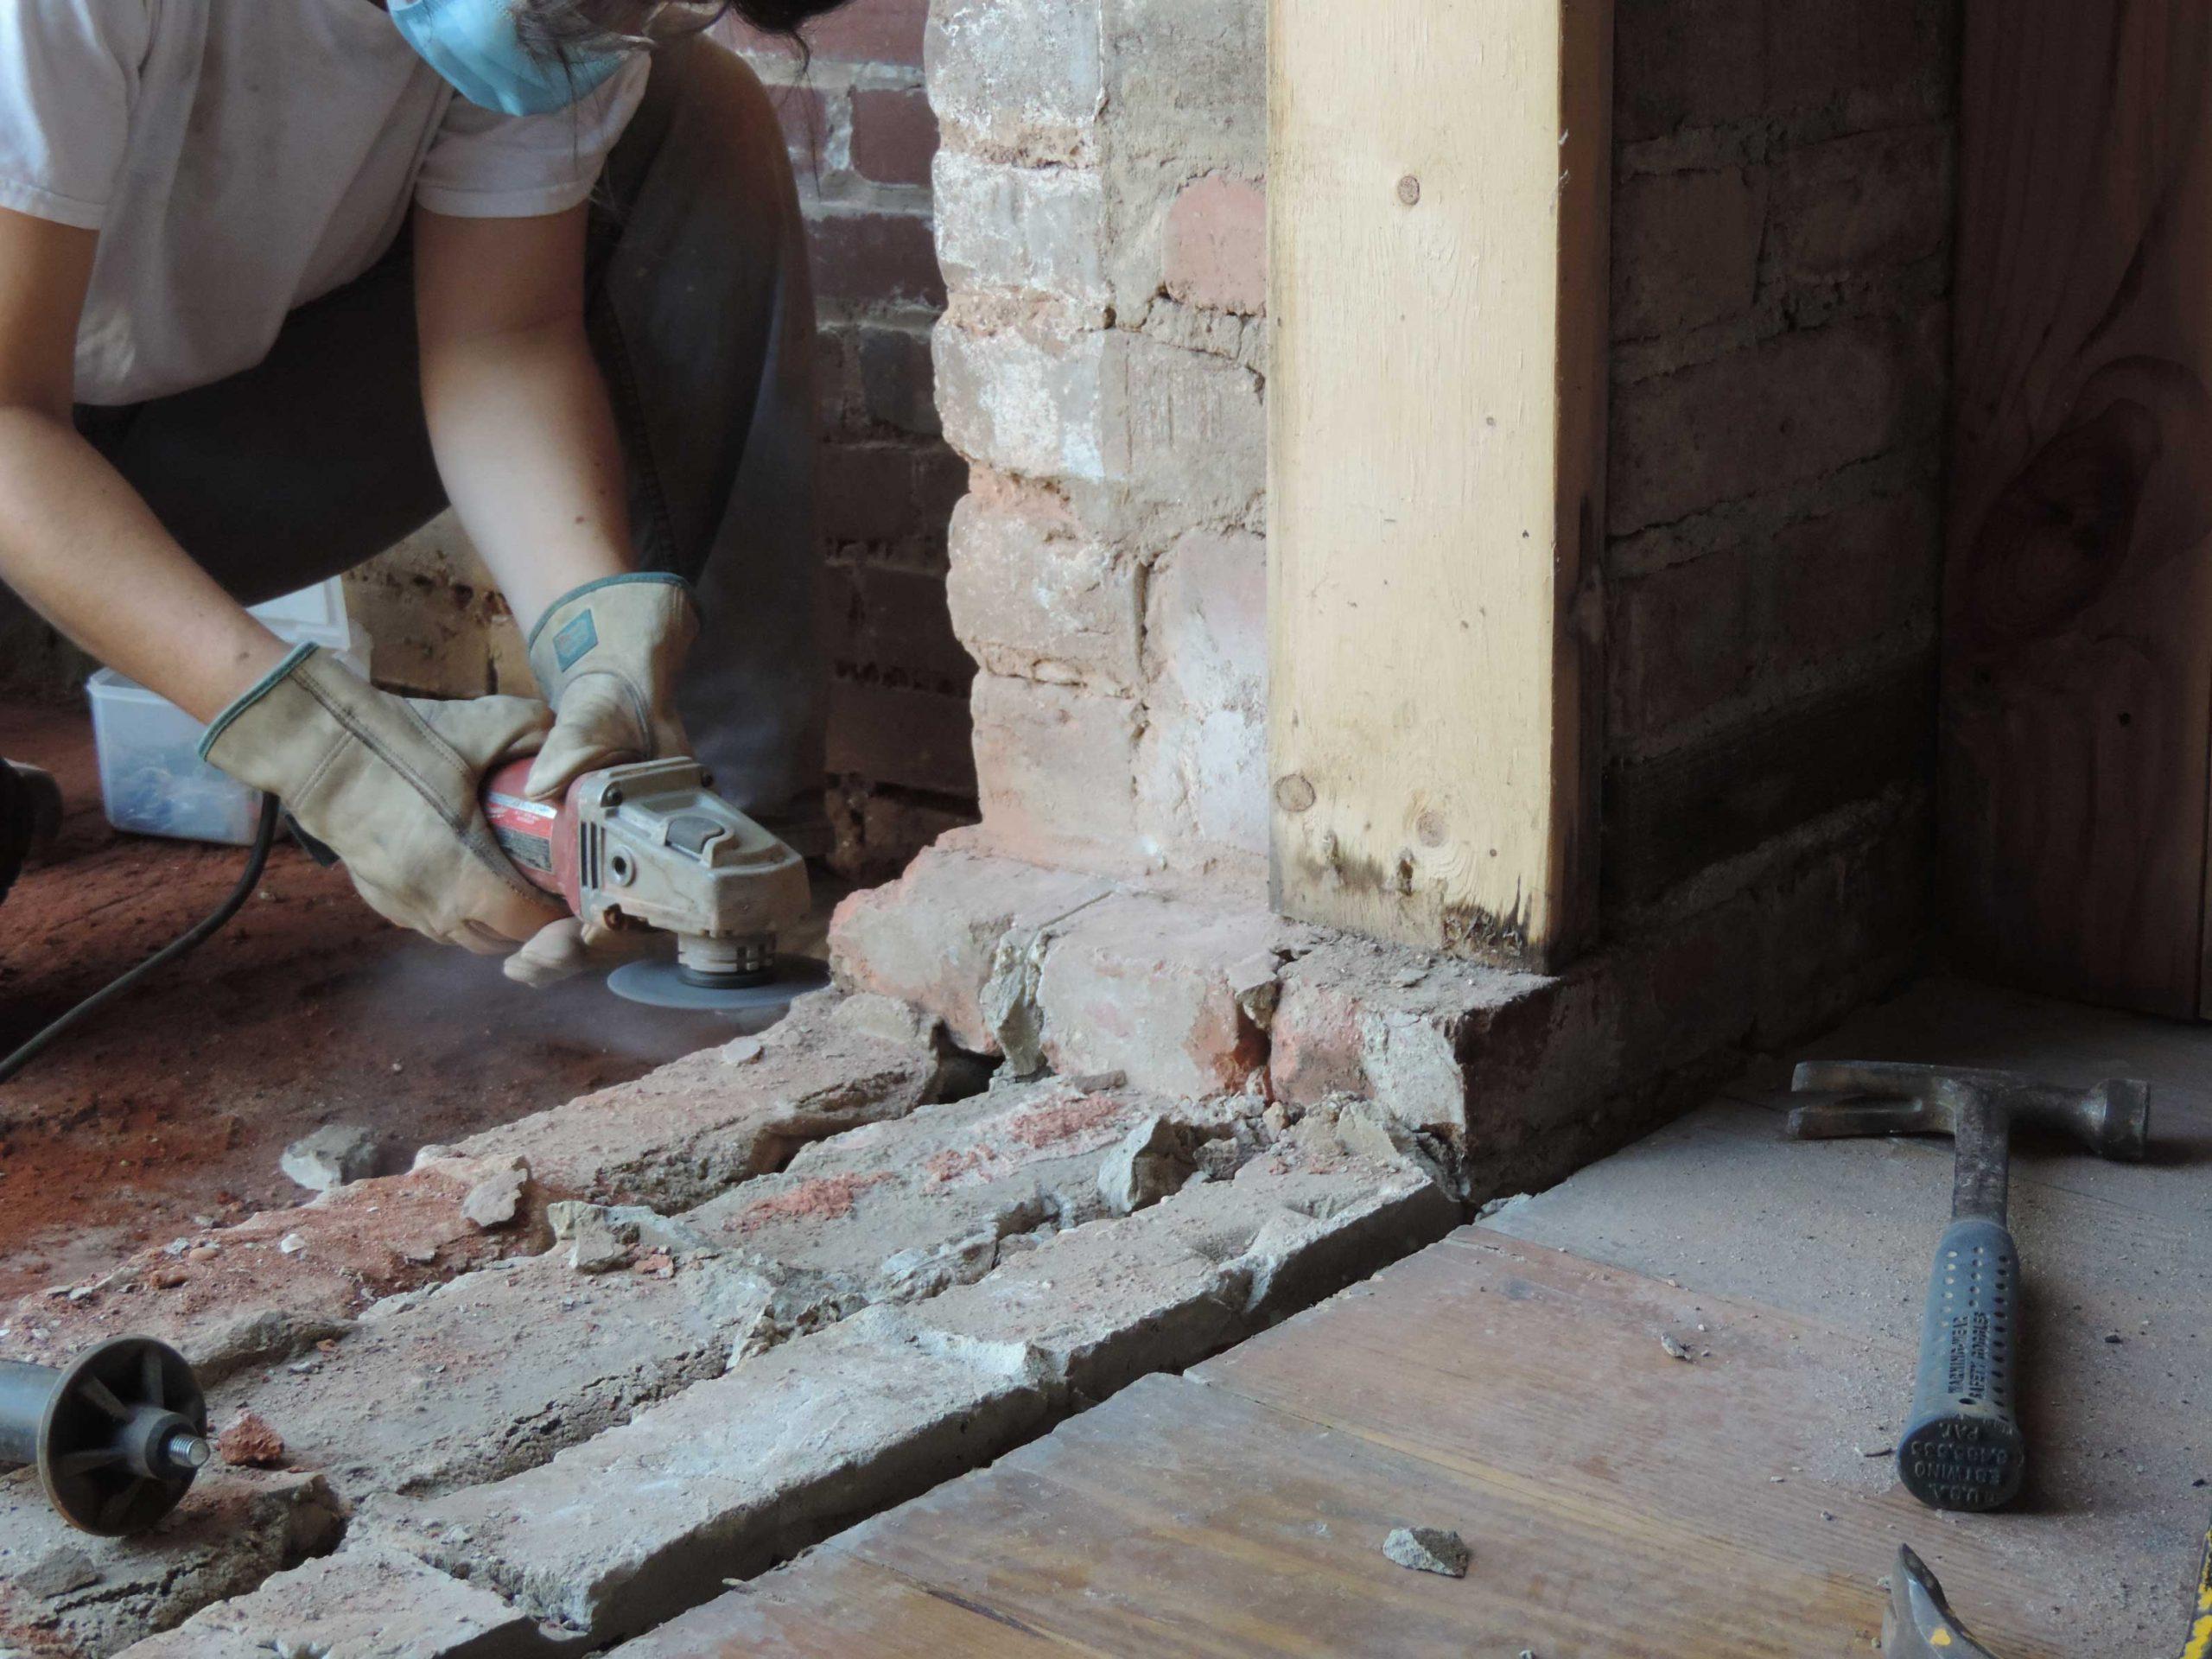 Removing bricks on door threshold